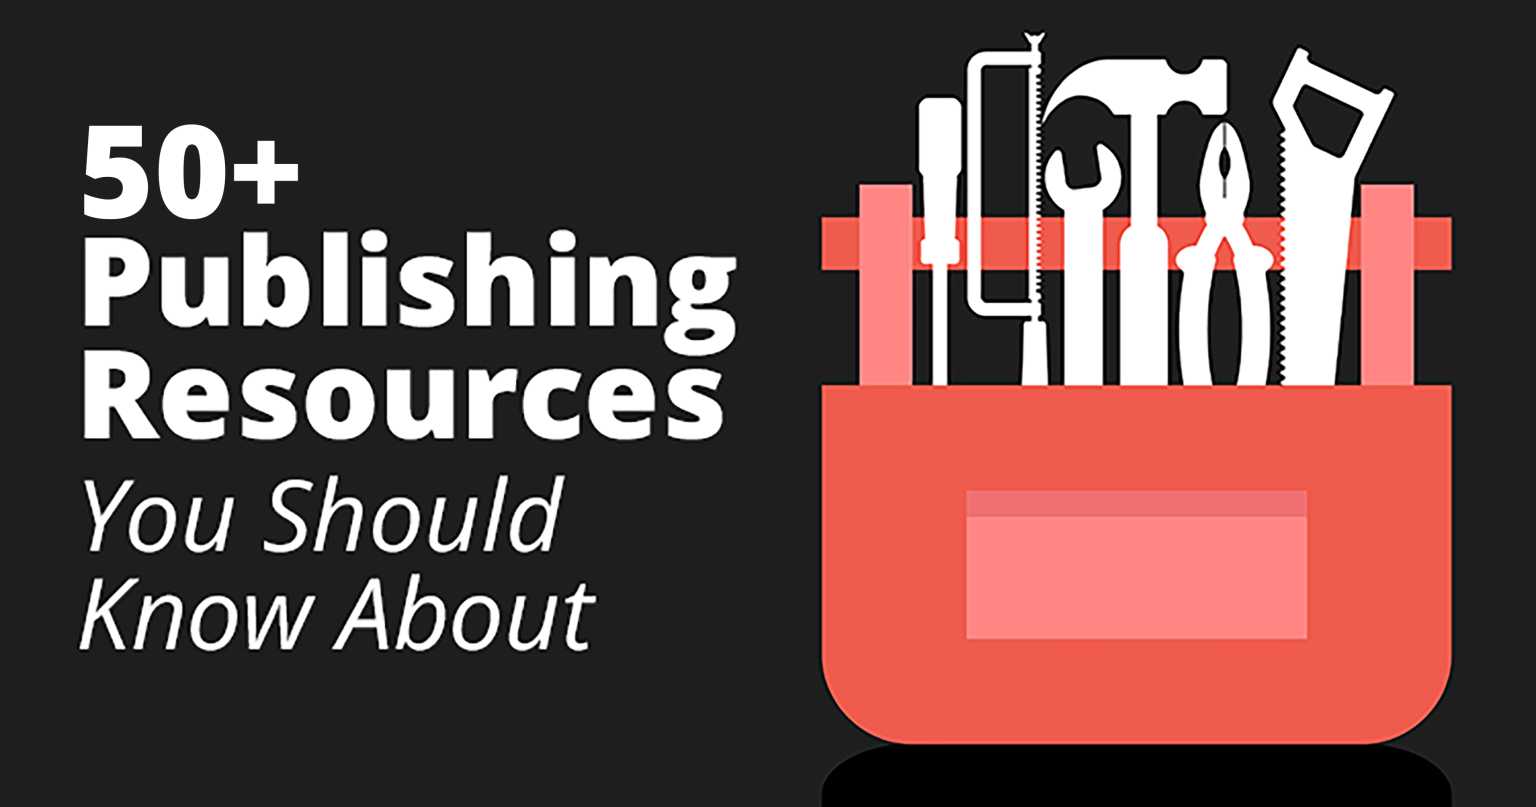 50+ Publishing Resources